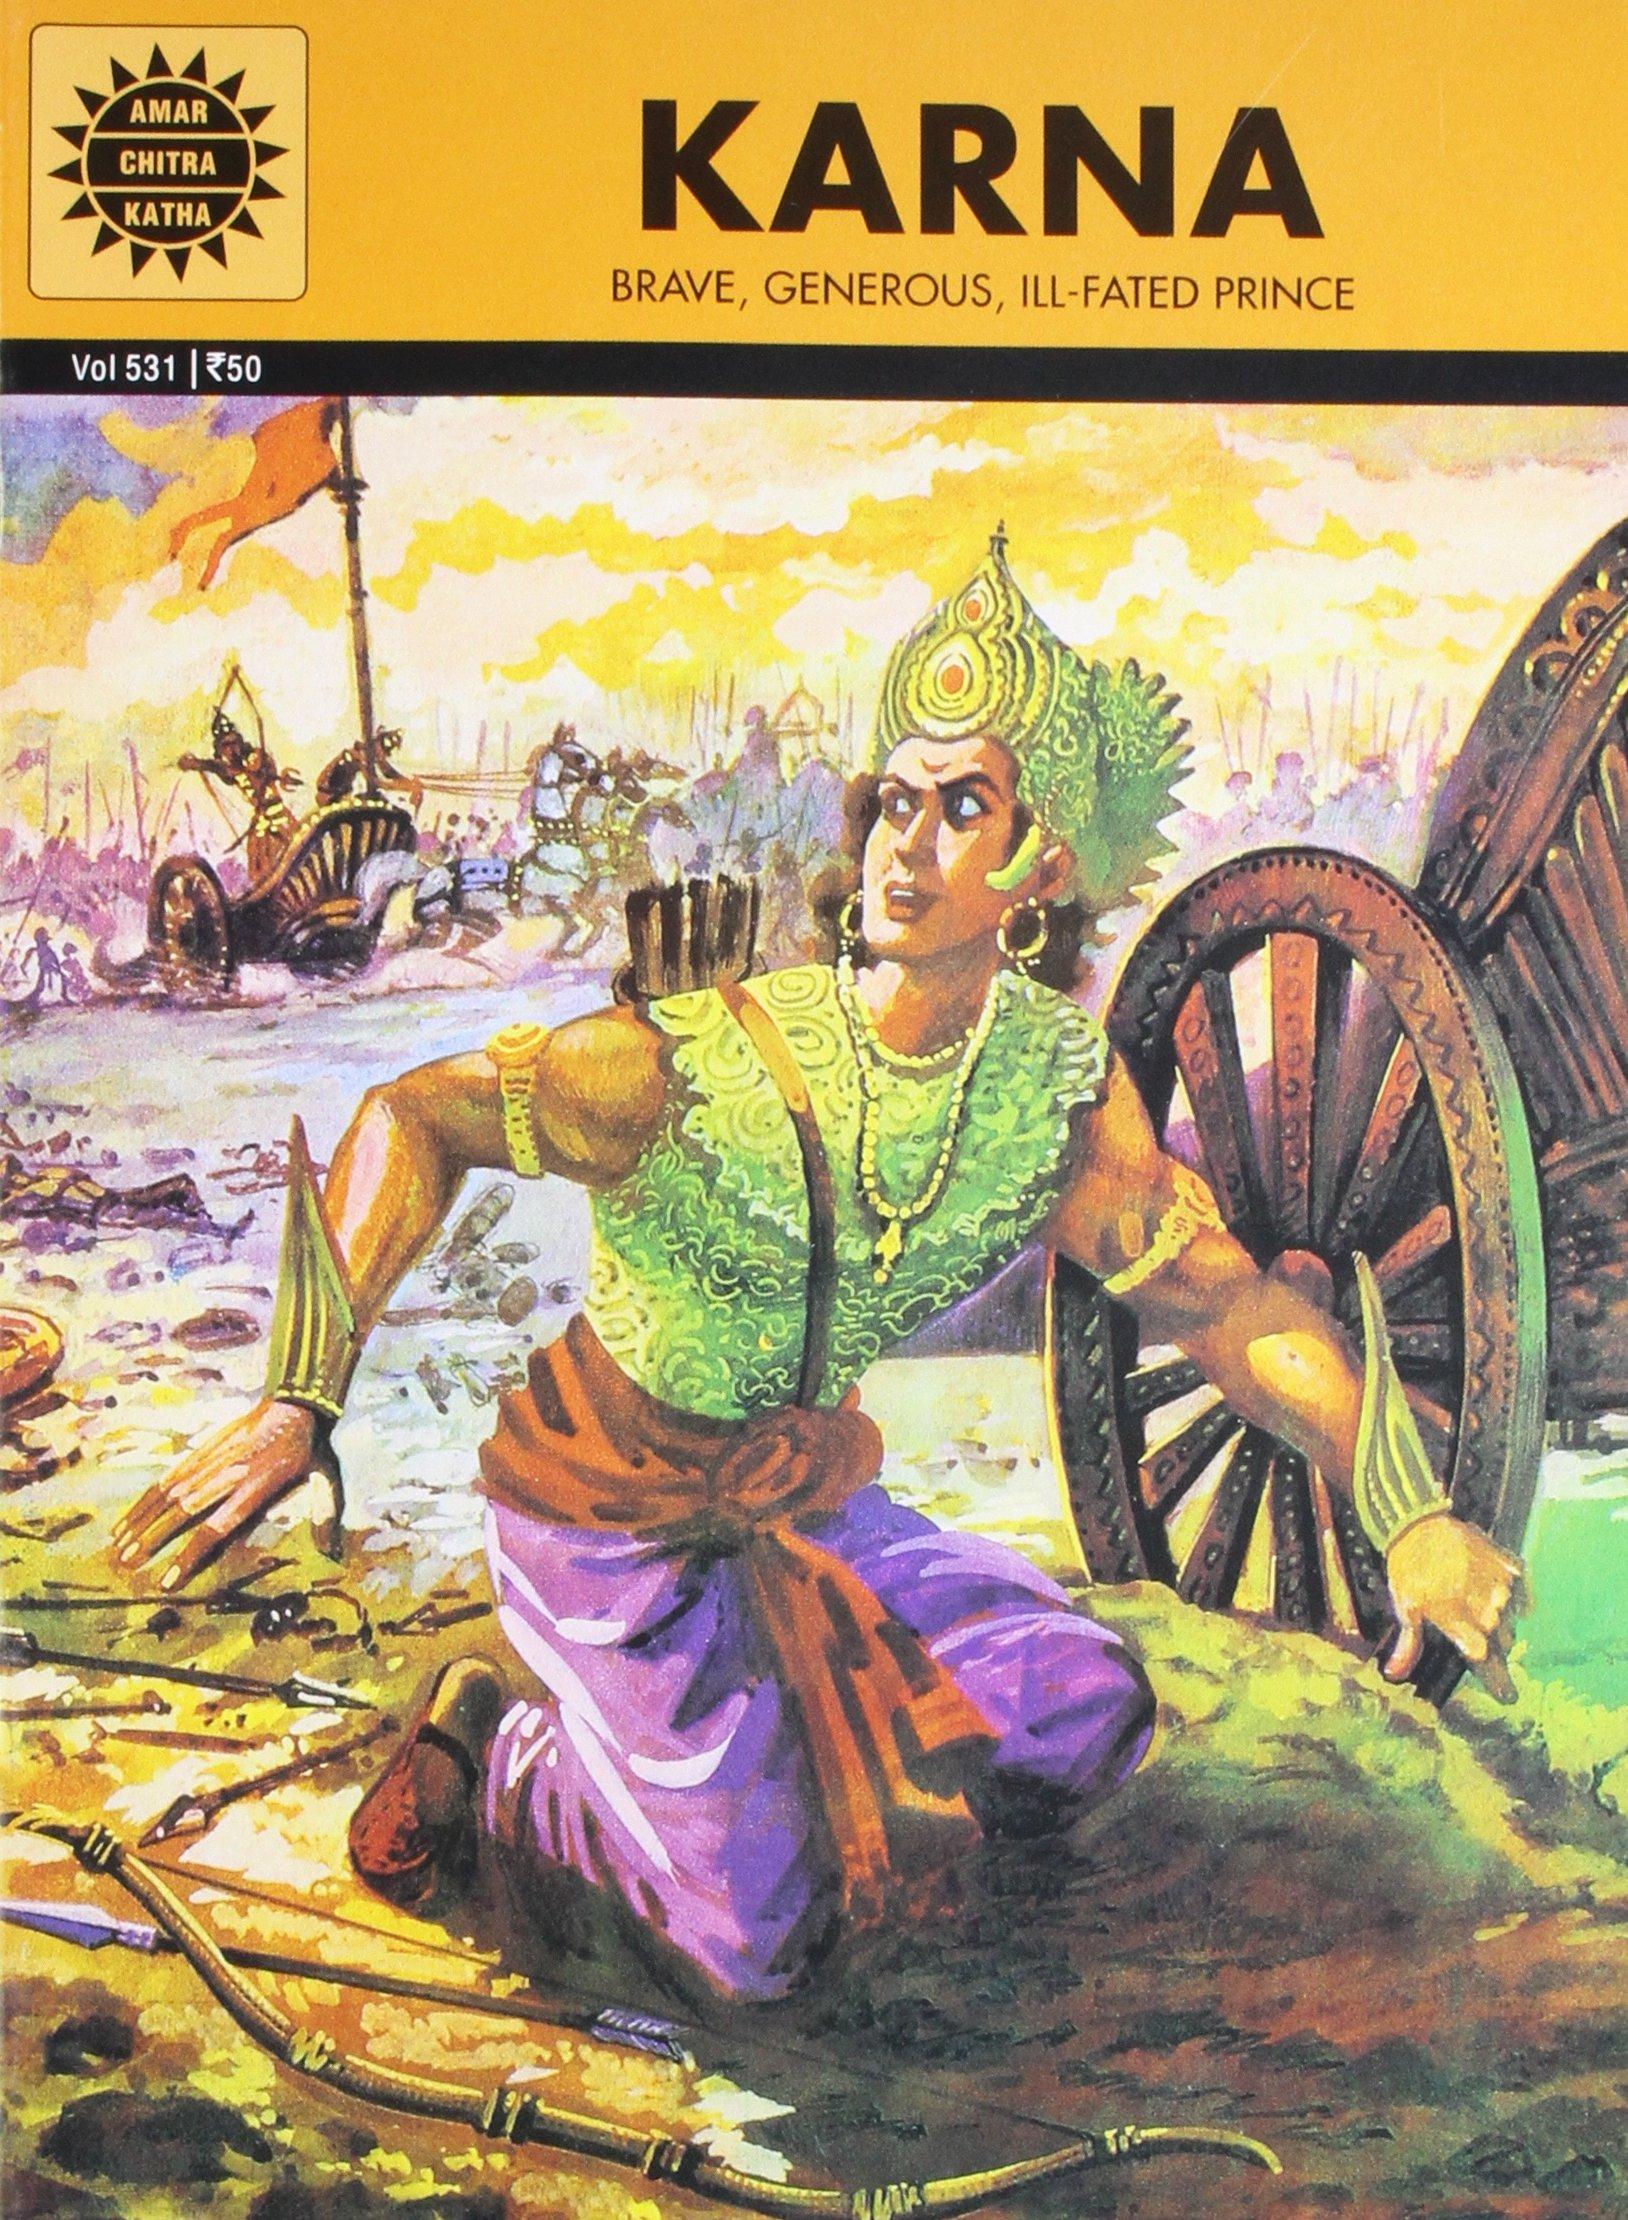 Karna 531 Kamala Chandrakant 9788189999490 Amazon Com Books